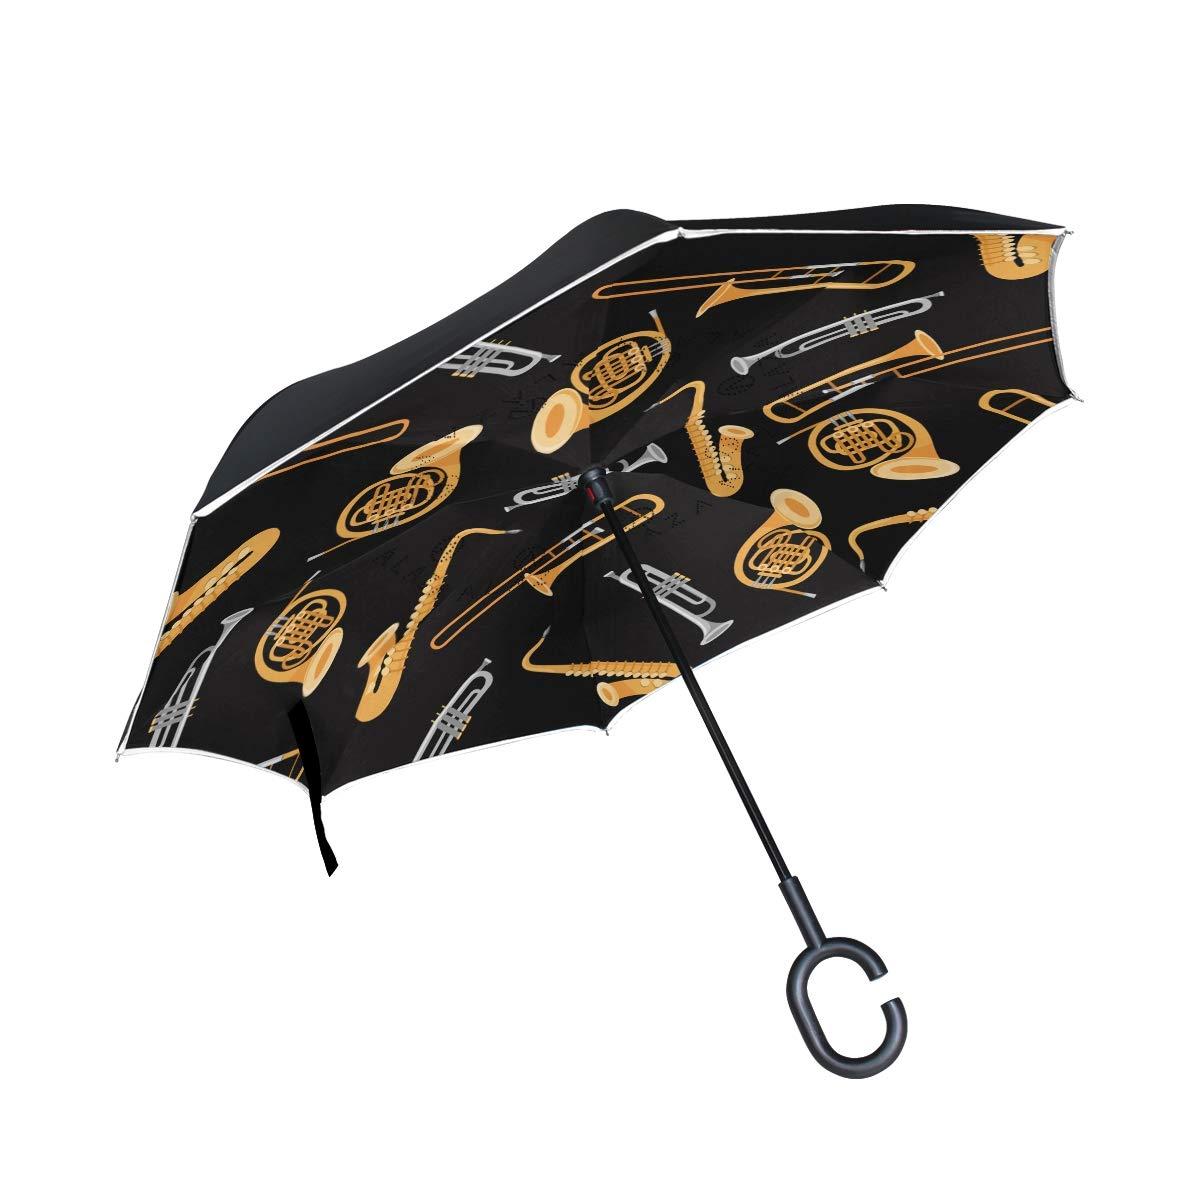 DERLONKAJE 2層 反転 絞り染め スパイラル カラフルパターン 傘 車 リバース 防風 雨傘 車 アウトドア C型ハンドル One Size Trombone Trumpet Saxophone French Horn B07LF822QY